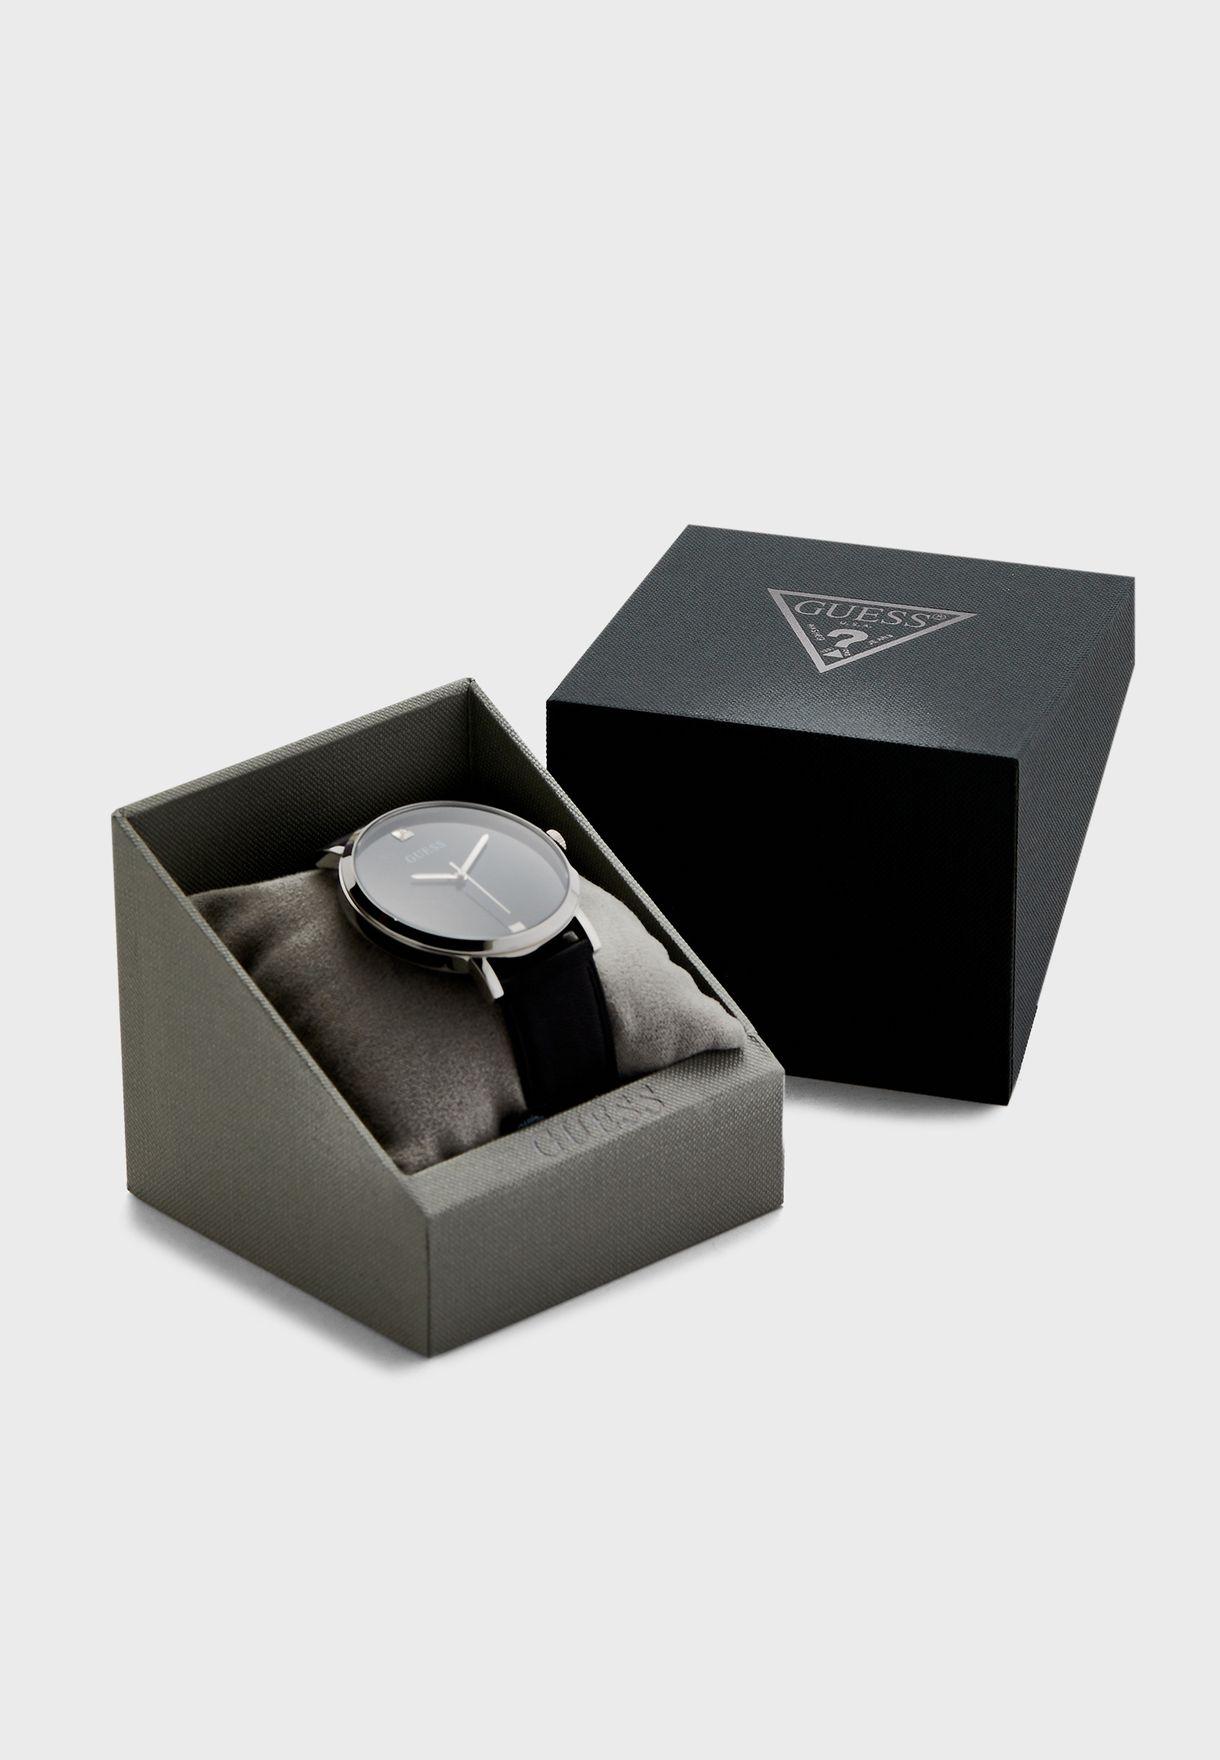 GW0009G1  Analog Watch